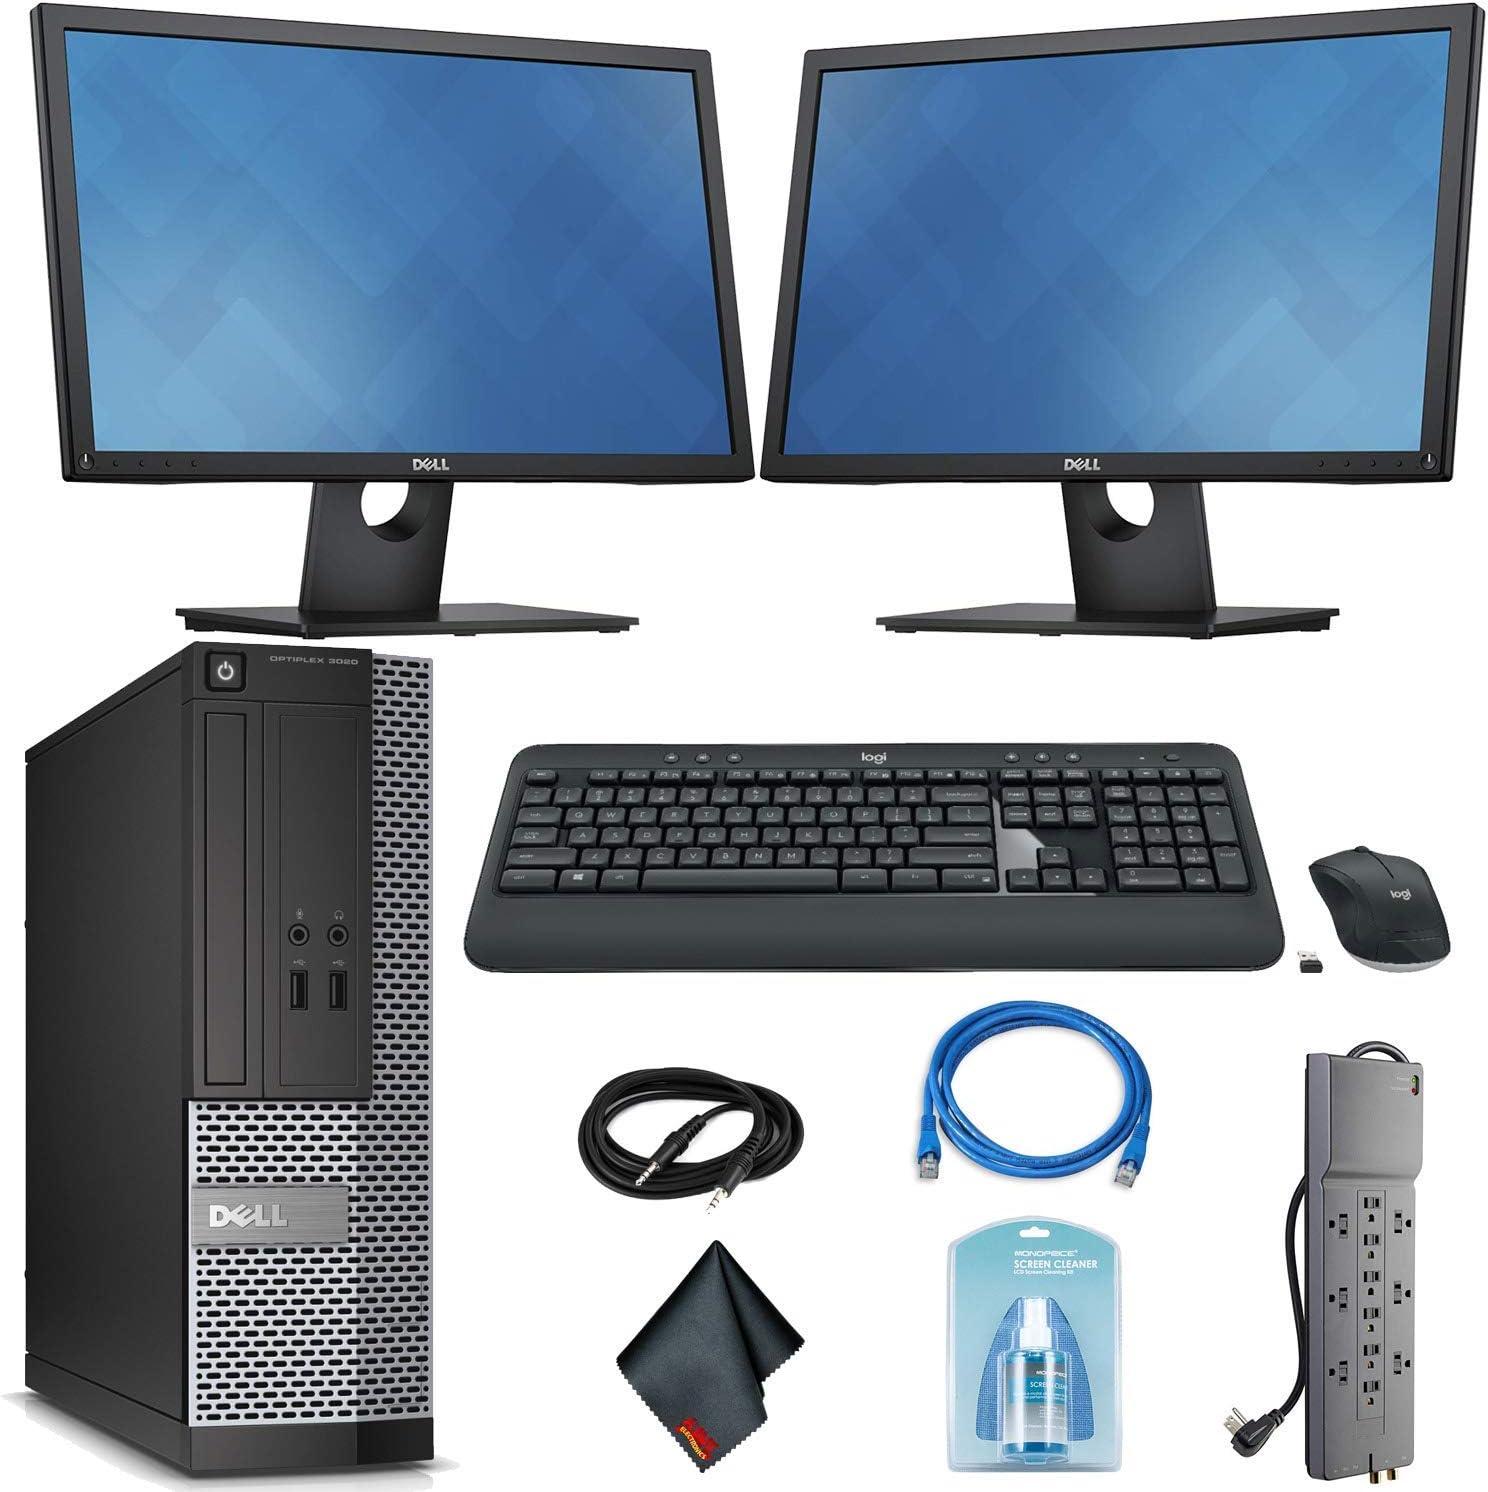 Dell OptiPlex 3020 Desktop Computer - Intel Core i5 i5-4590 3.30 GHz + Wireless Keyboard & Mouse + (2) Dual 22 Inch Monitors (Renewed)